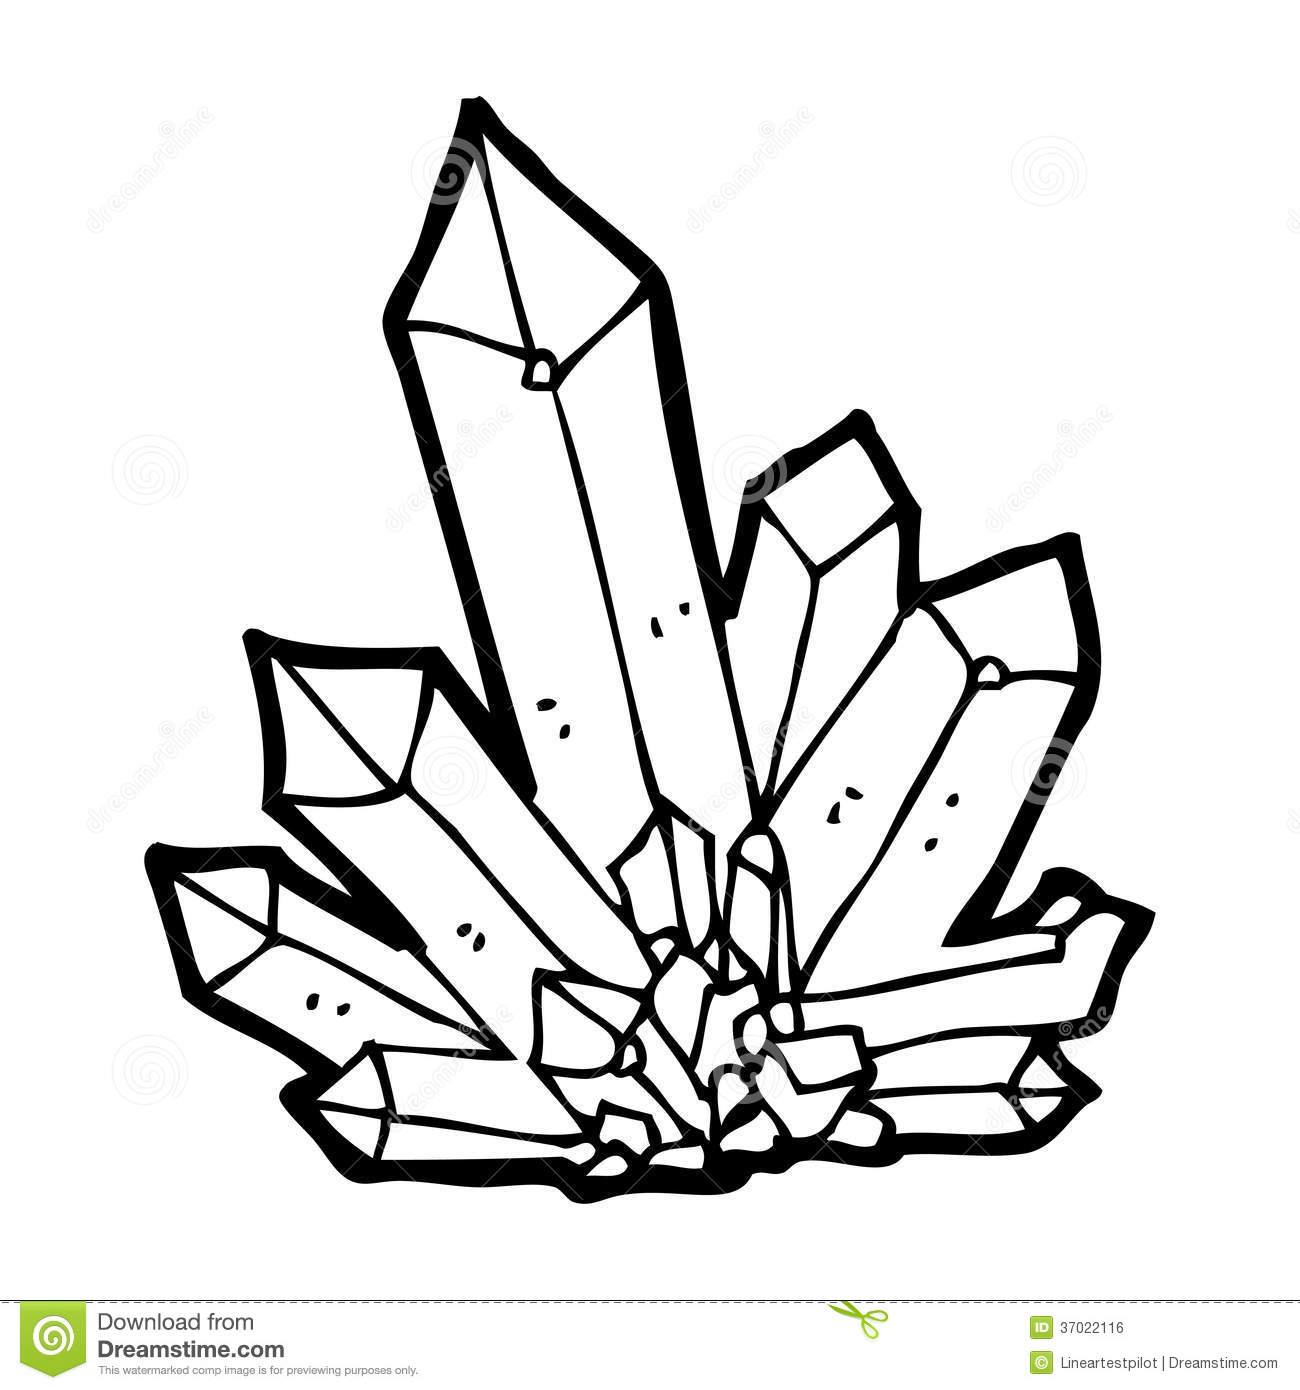 1300x1390 Pix For Gt Quartz Crystal Drawing Vbs 2015 Crystal